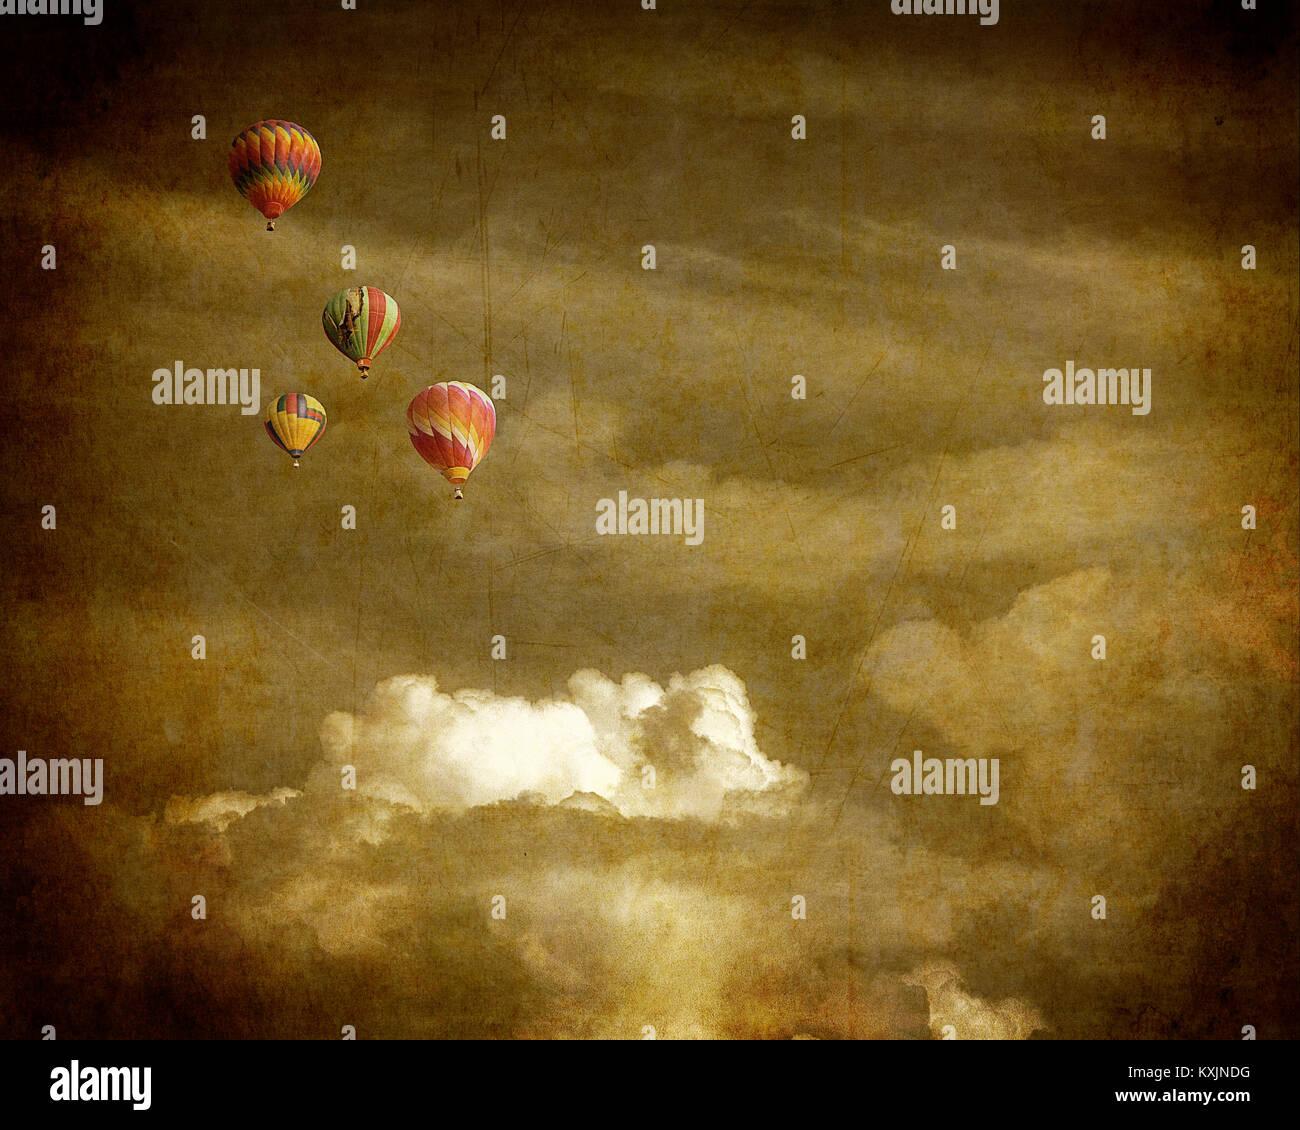 DIGITAL ART: Fly Me - Stock Image